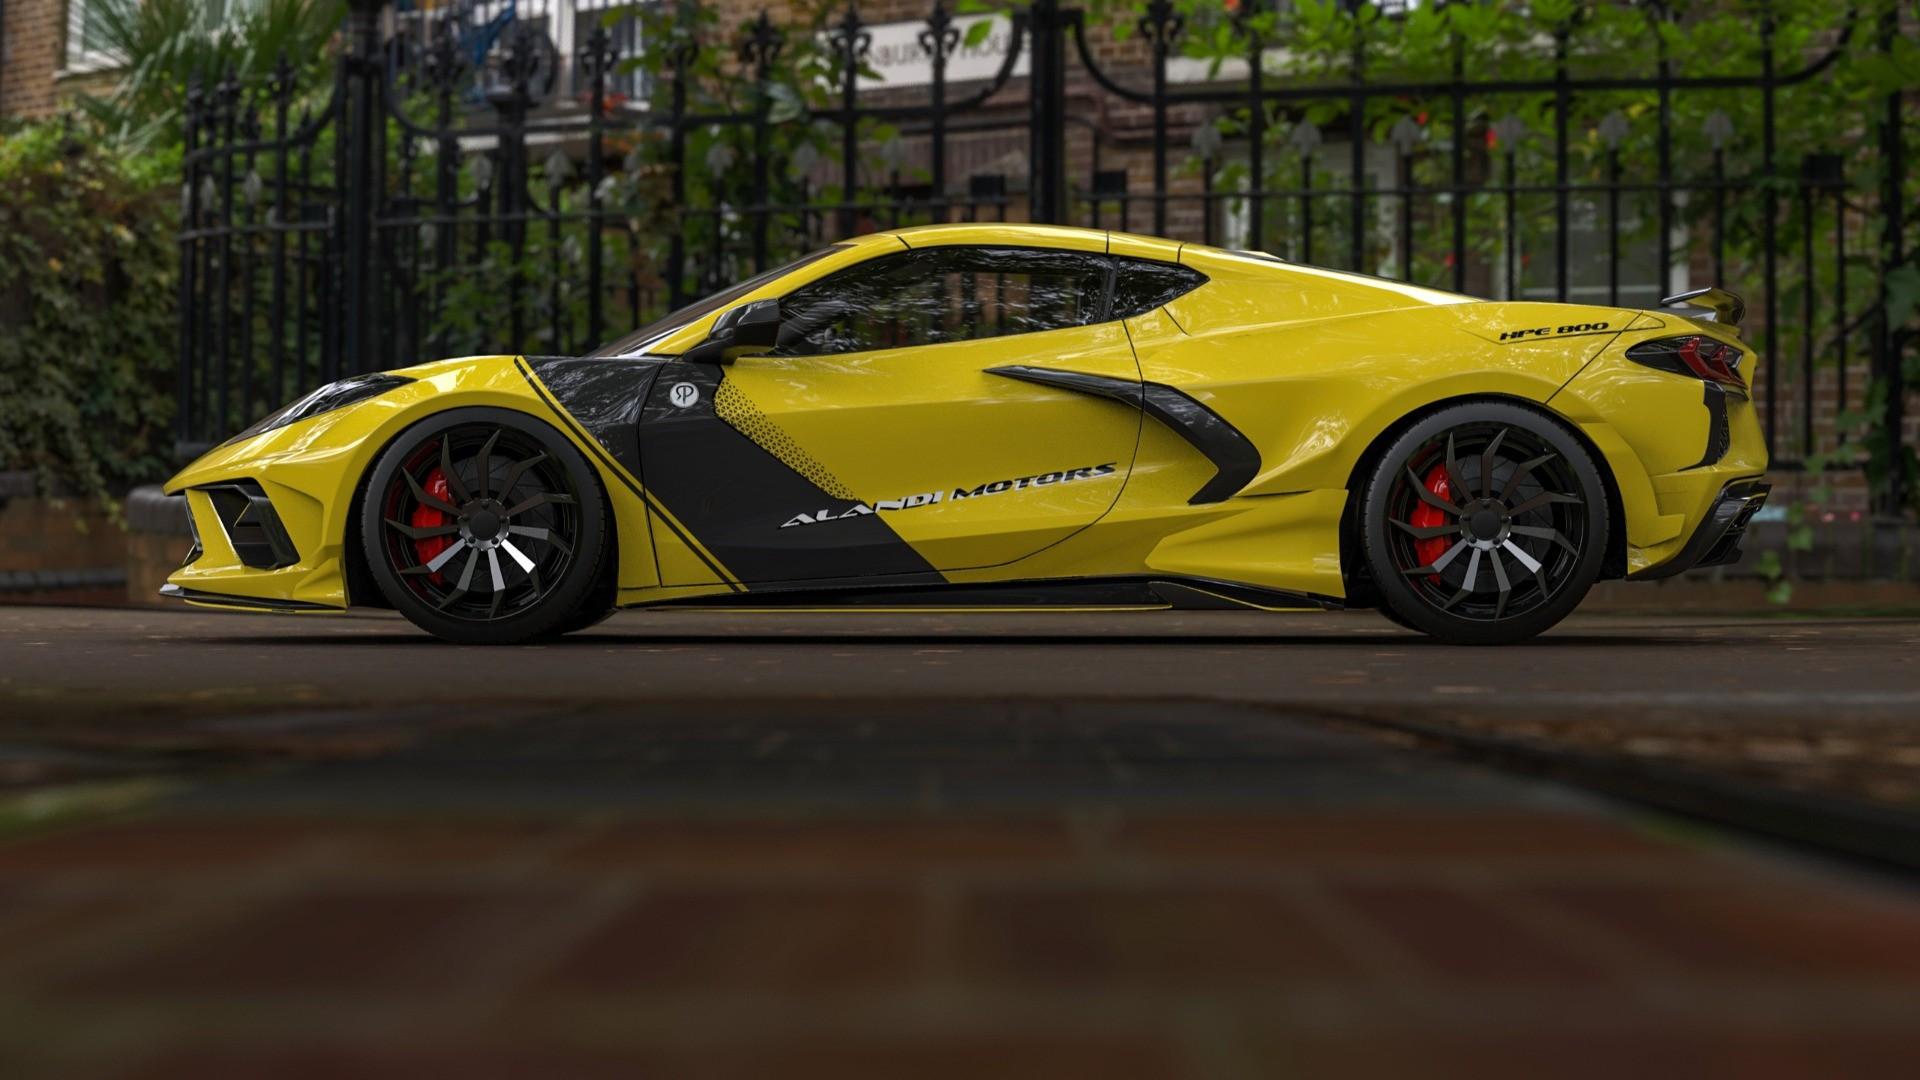 Chevrolet-Corvette-Centurion-by-Alandi-Motors-8